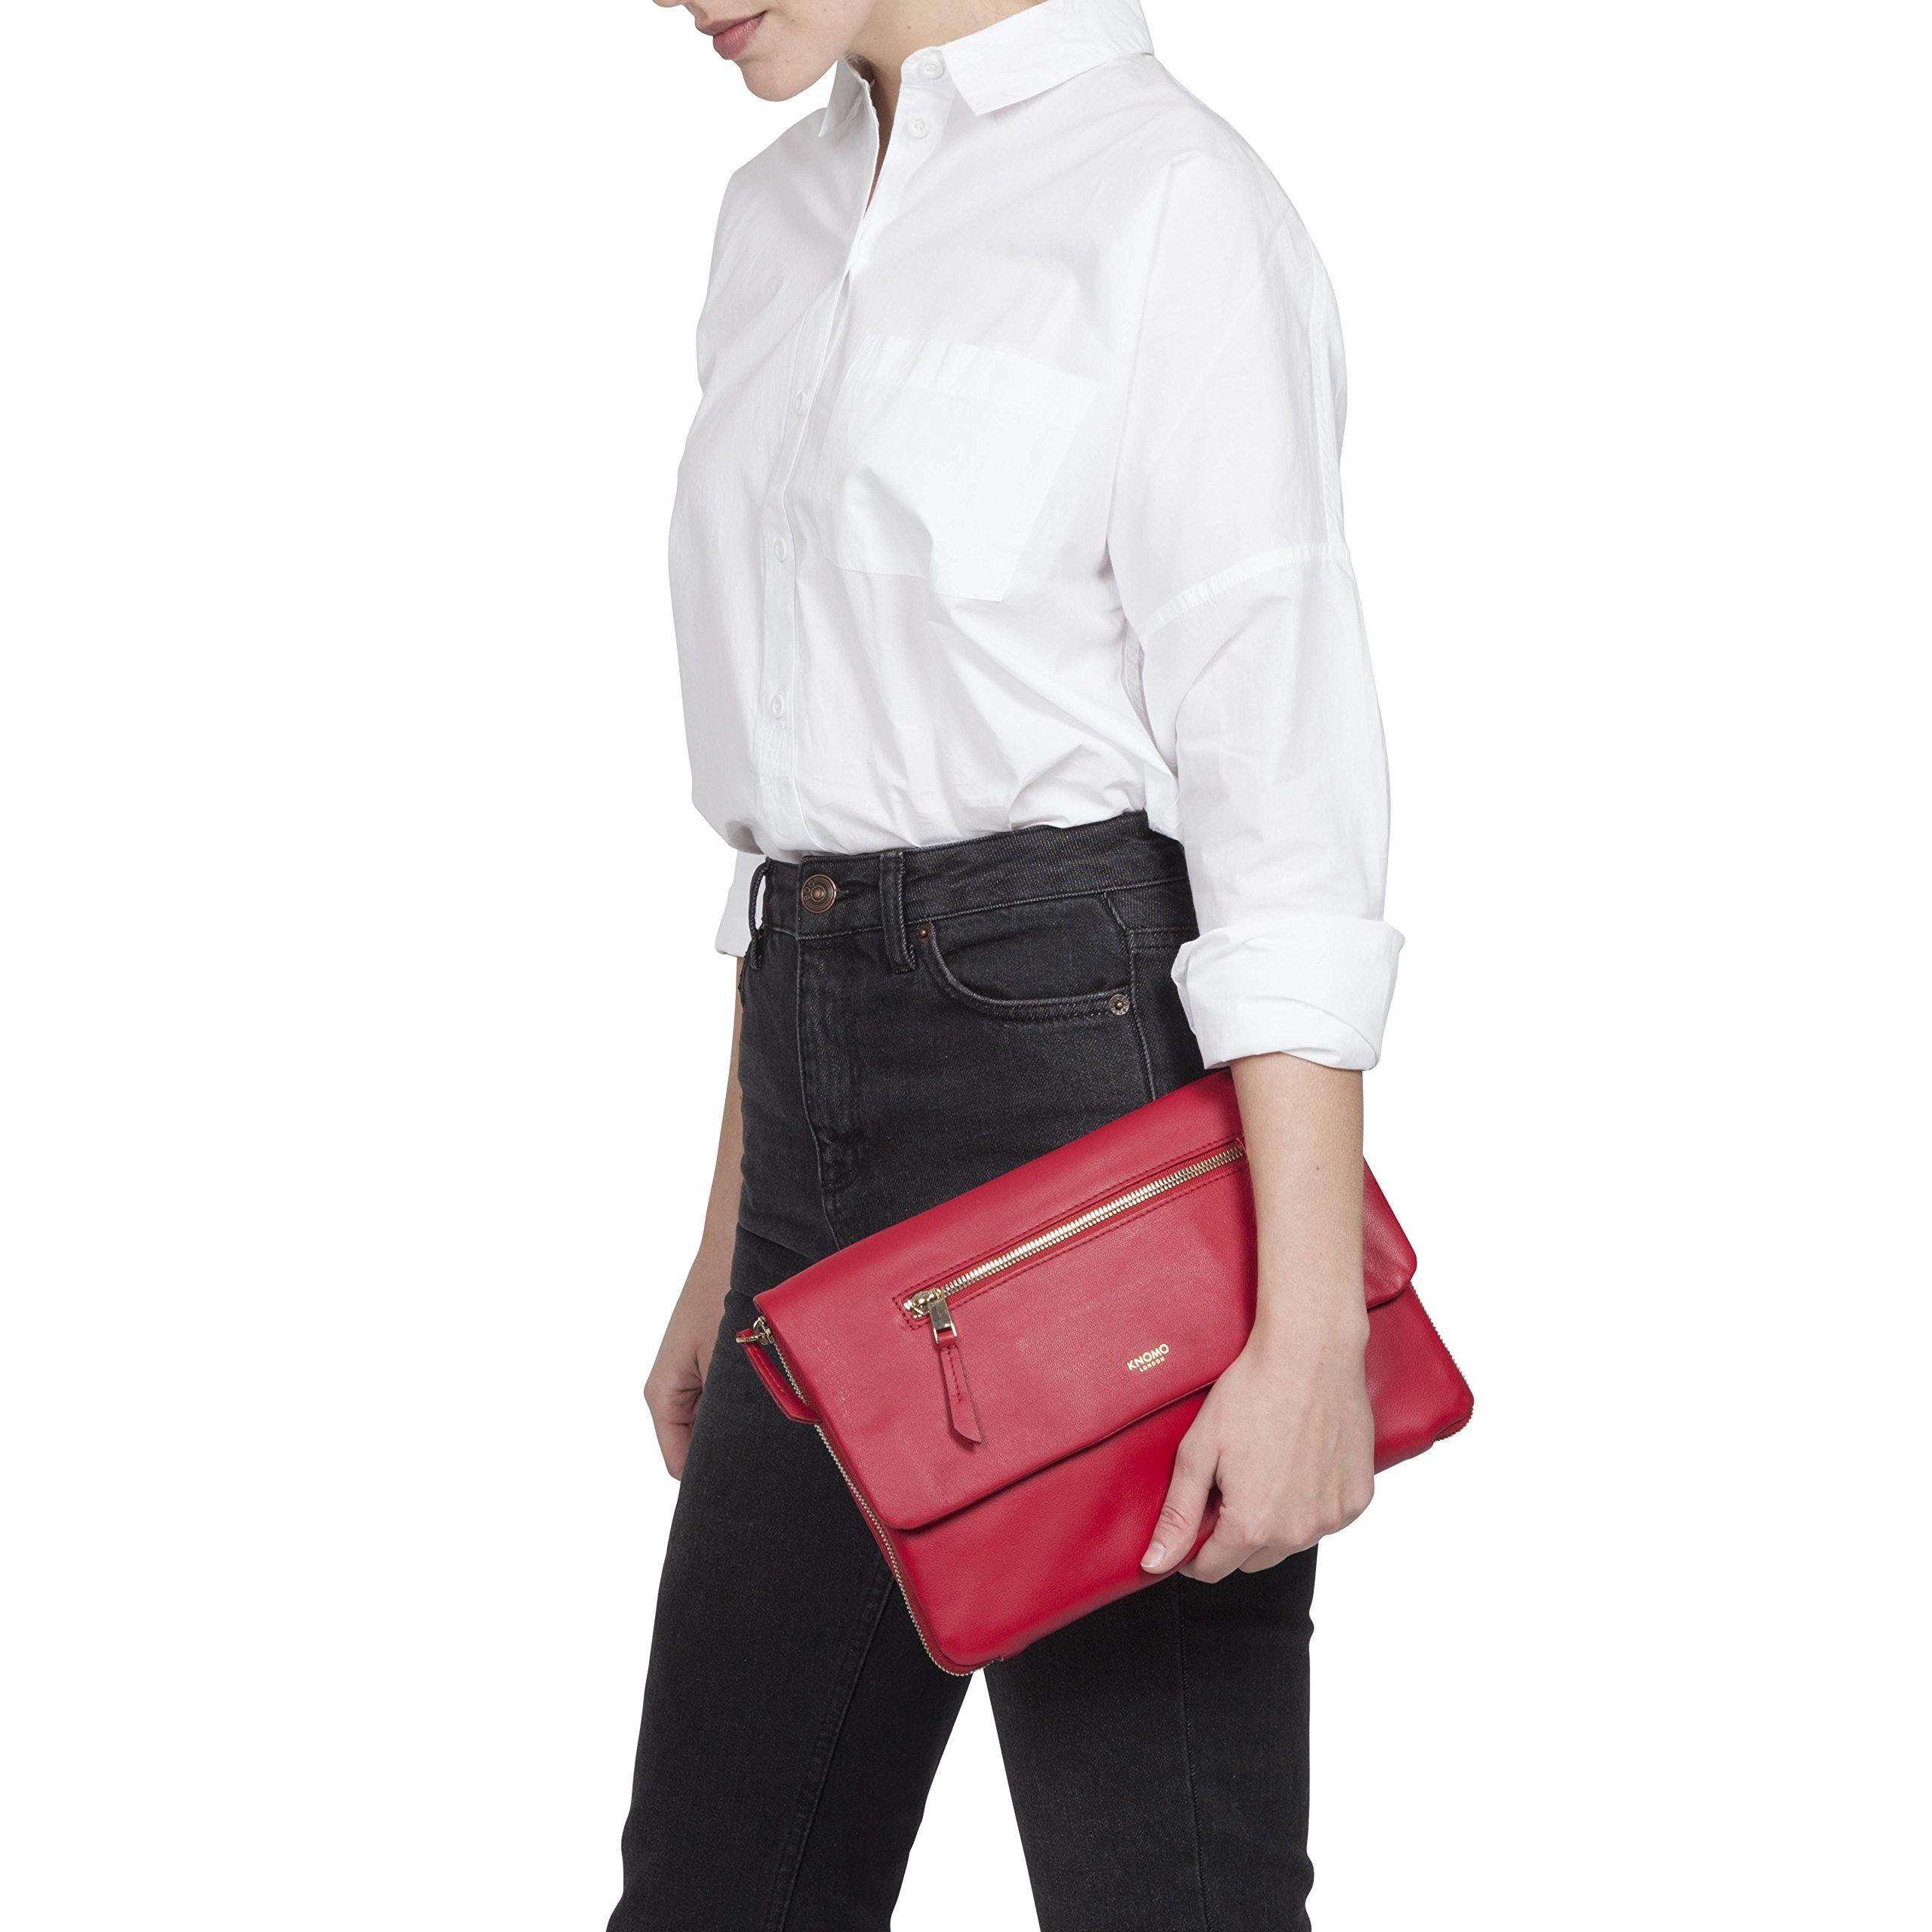 KNOMO Elektronista Digital Leather Clutch / Shoulder Bag with included portable battery